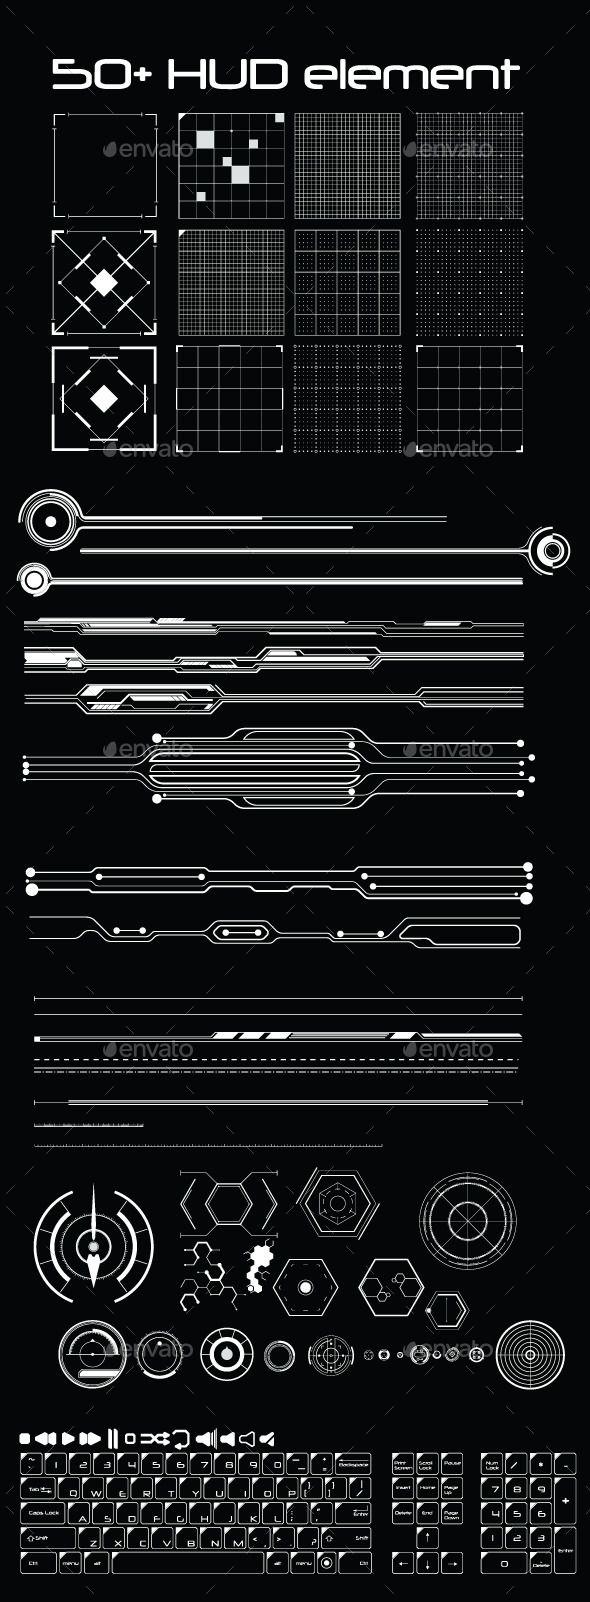 50+ Hud Element Pack Vector AI Illustrator. Download here: graphicriver.net/…